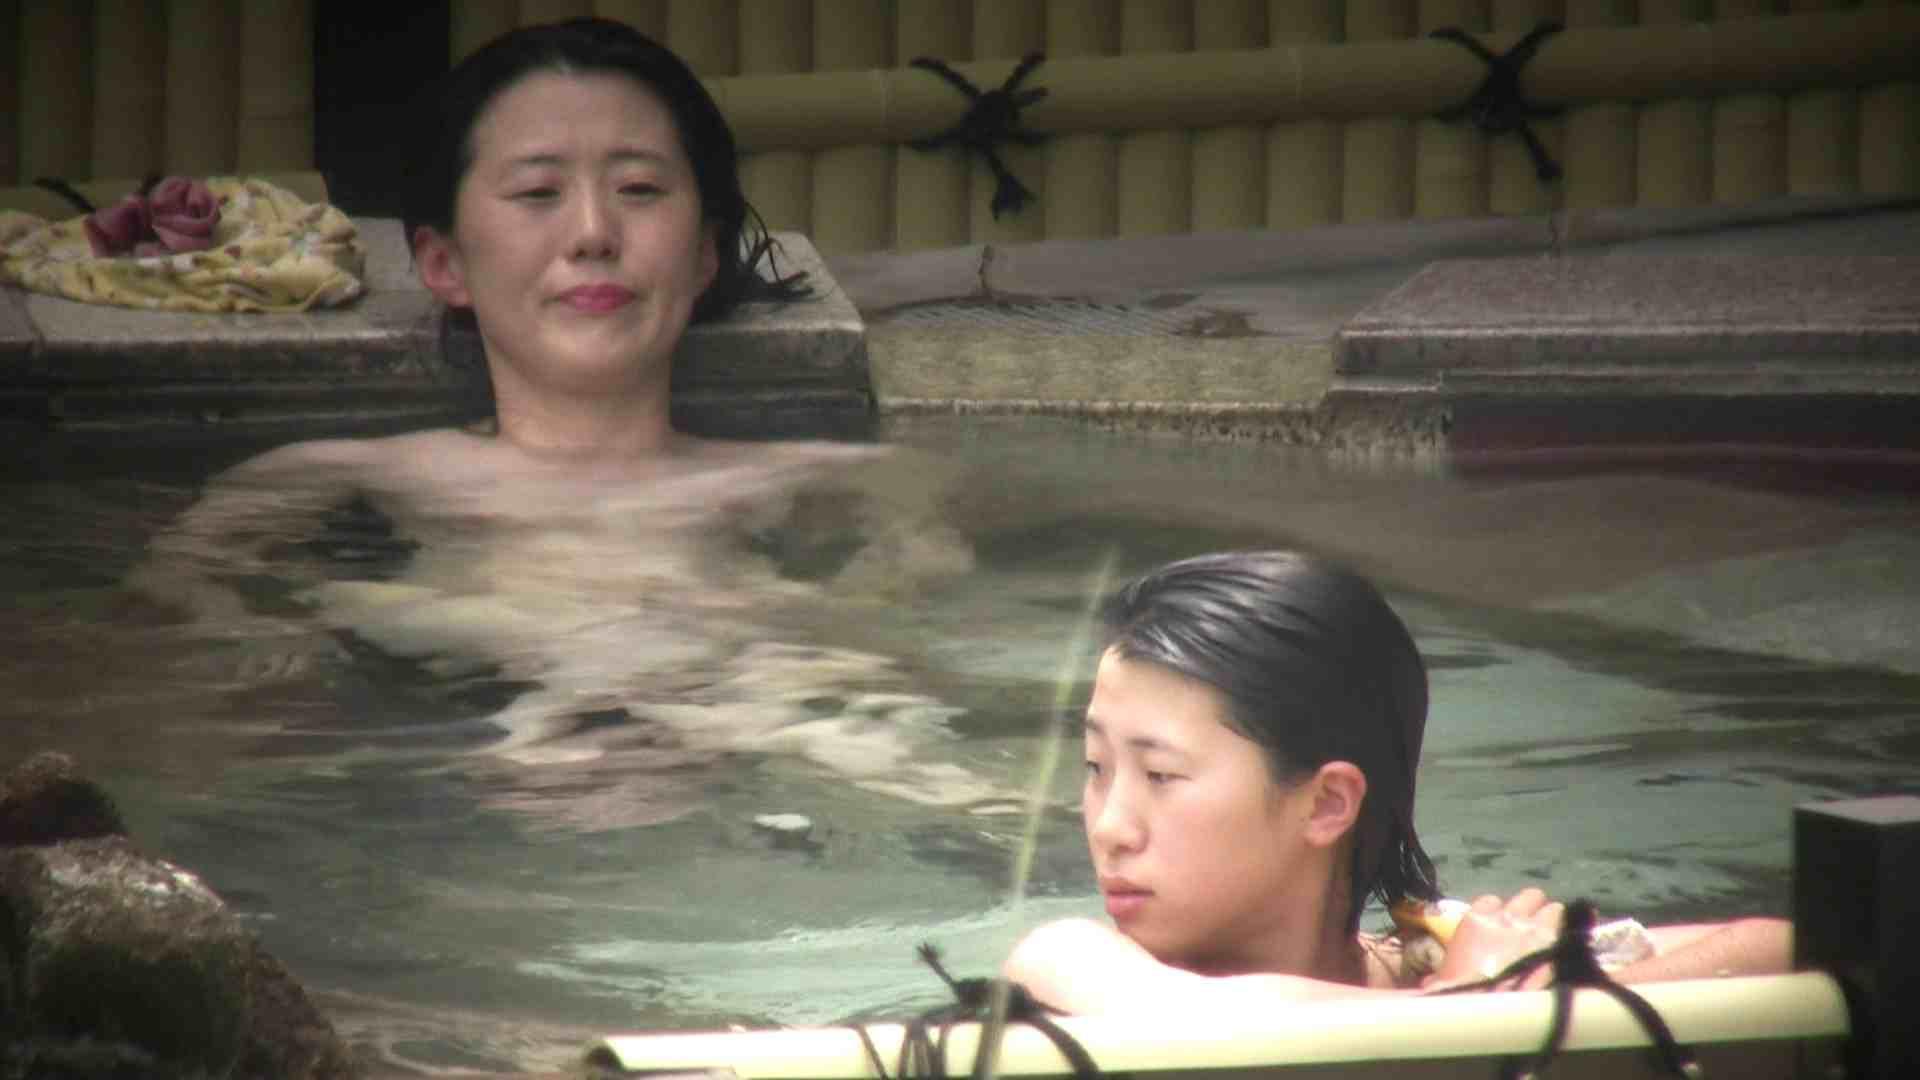 Aquaな露天風呂Vol.124 綺麗なOLたち エロ画像 72枚 2